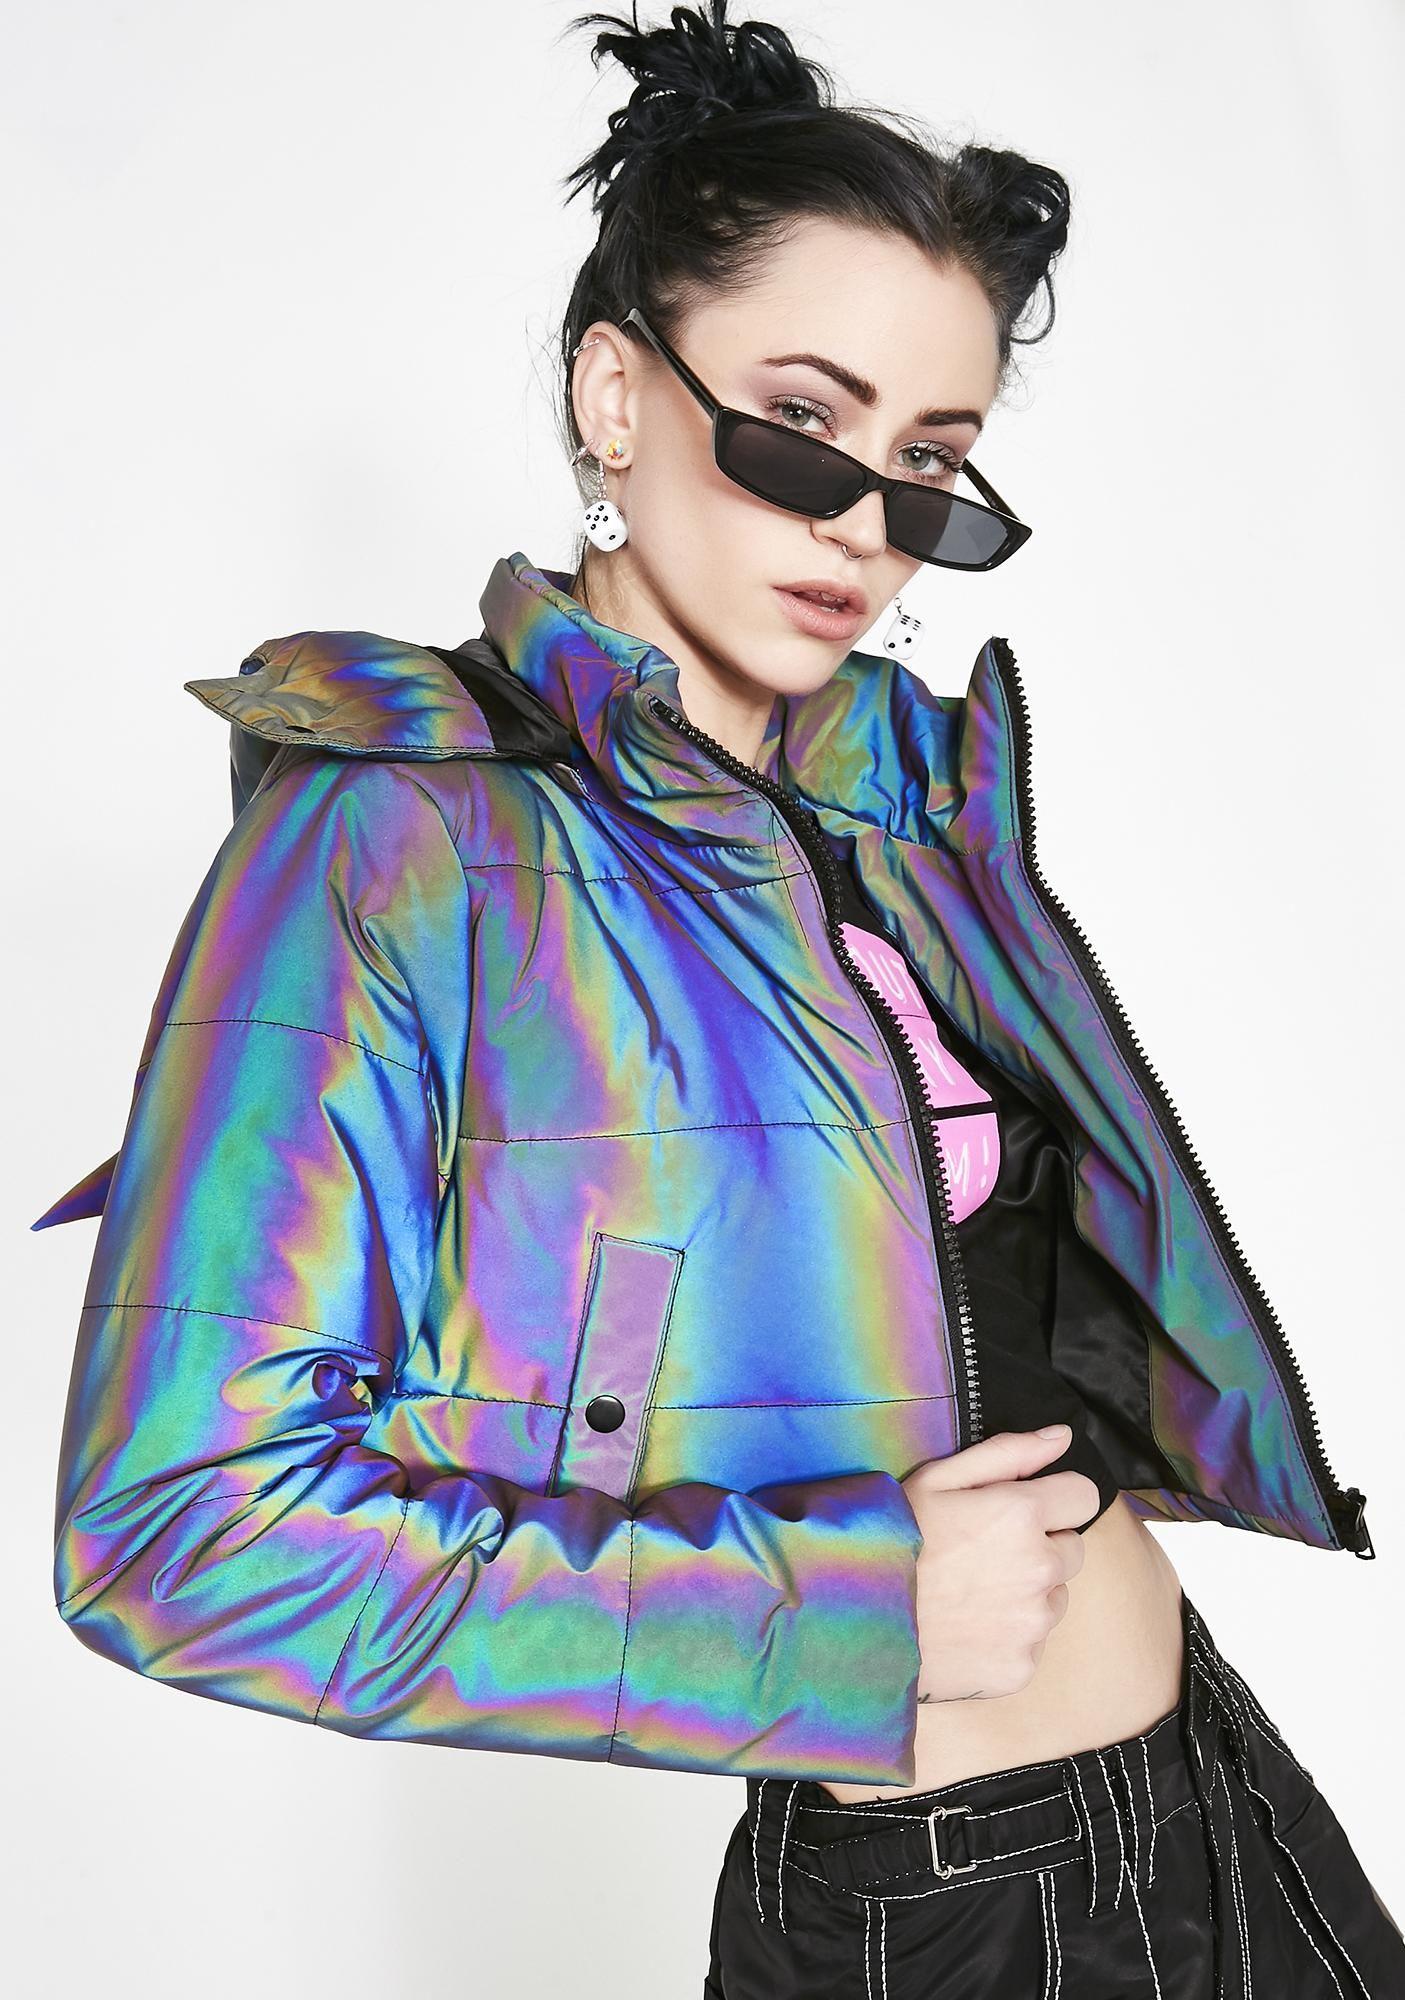 Night Savage Signalz Reflective Jacket Reflective Jacket Holographic Fashion Women [ 2000 x 1405 Pixel ]